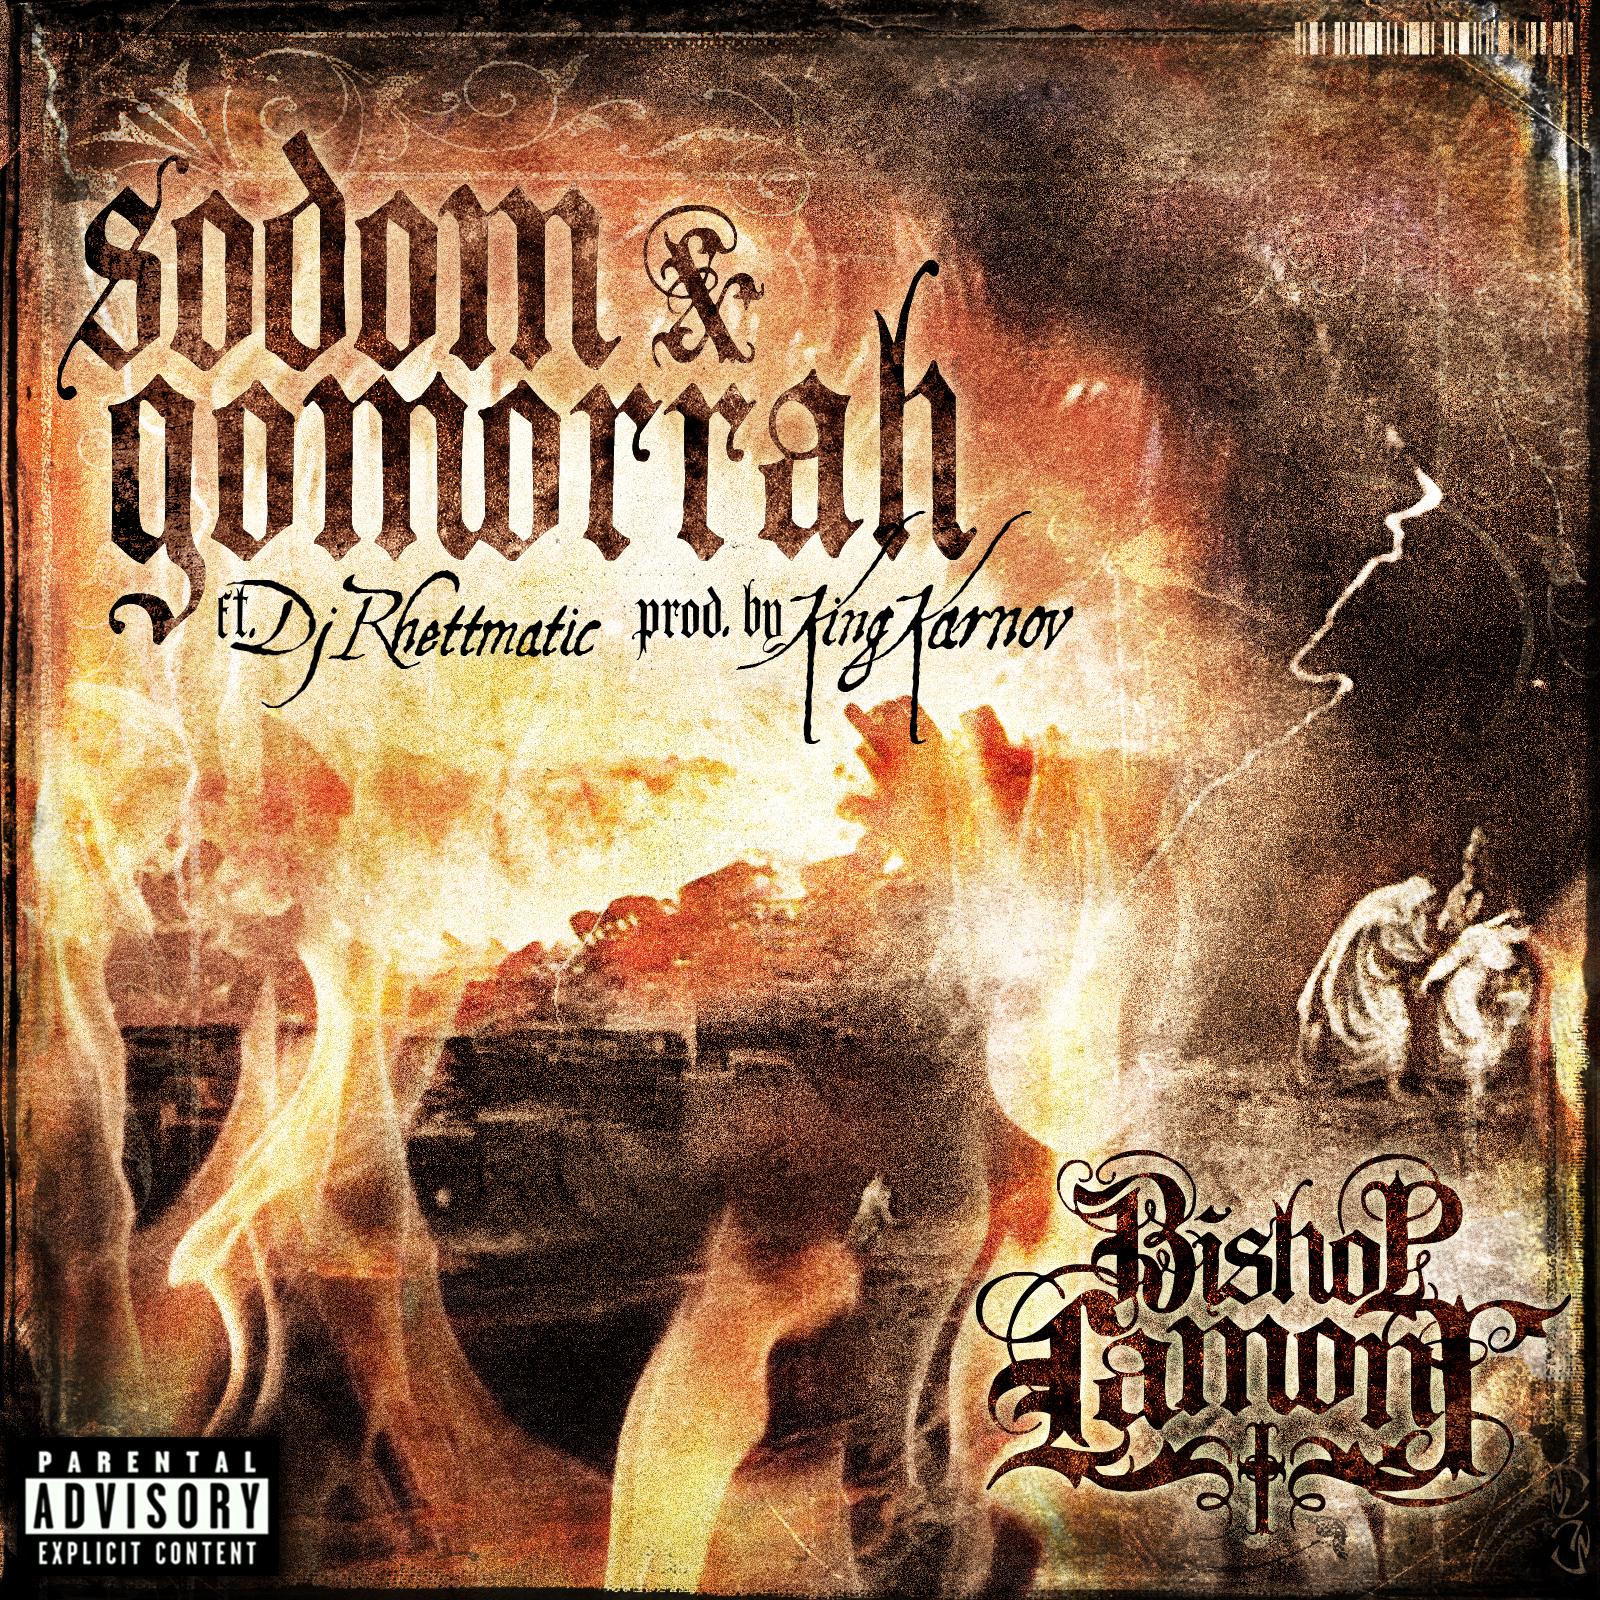 Sodom & Gomorrah_Cover Art_FINAL_iTunes_DIRTY.jpg